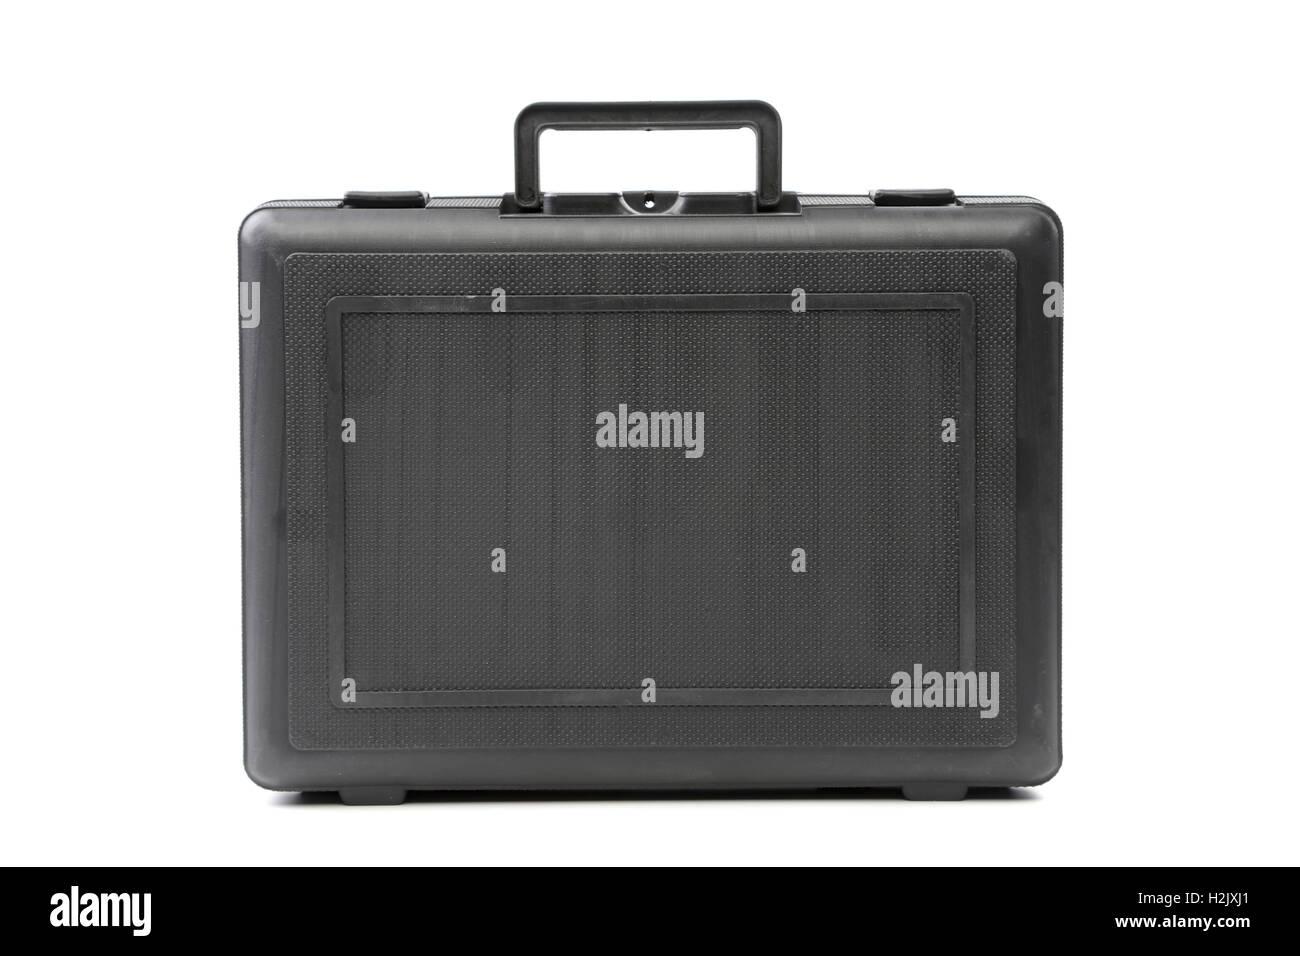 Black heavy-duty case. - Stock Image